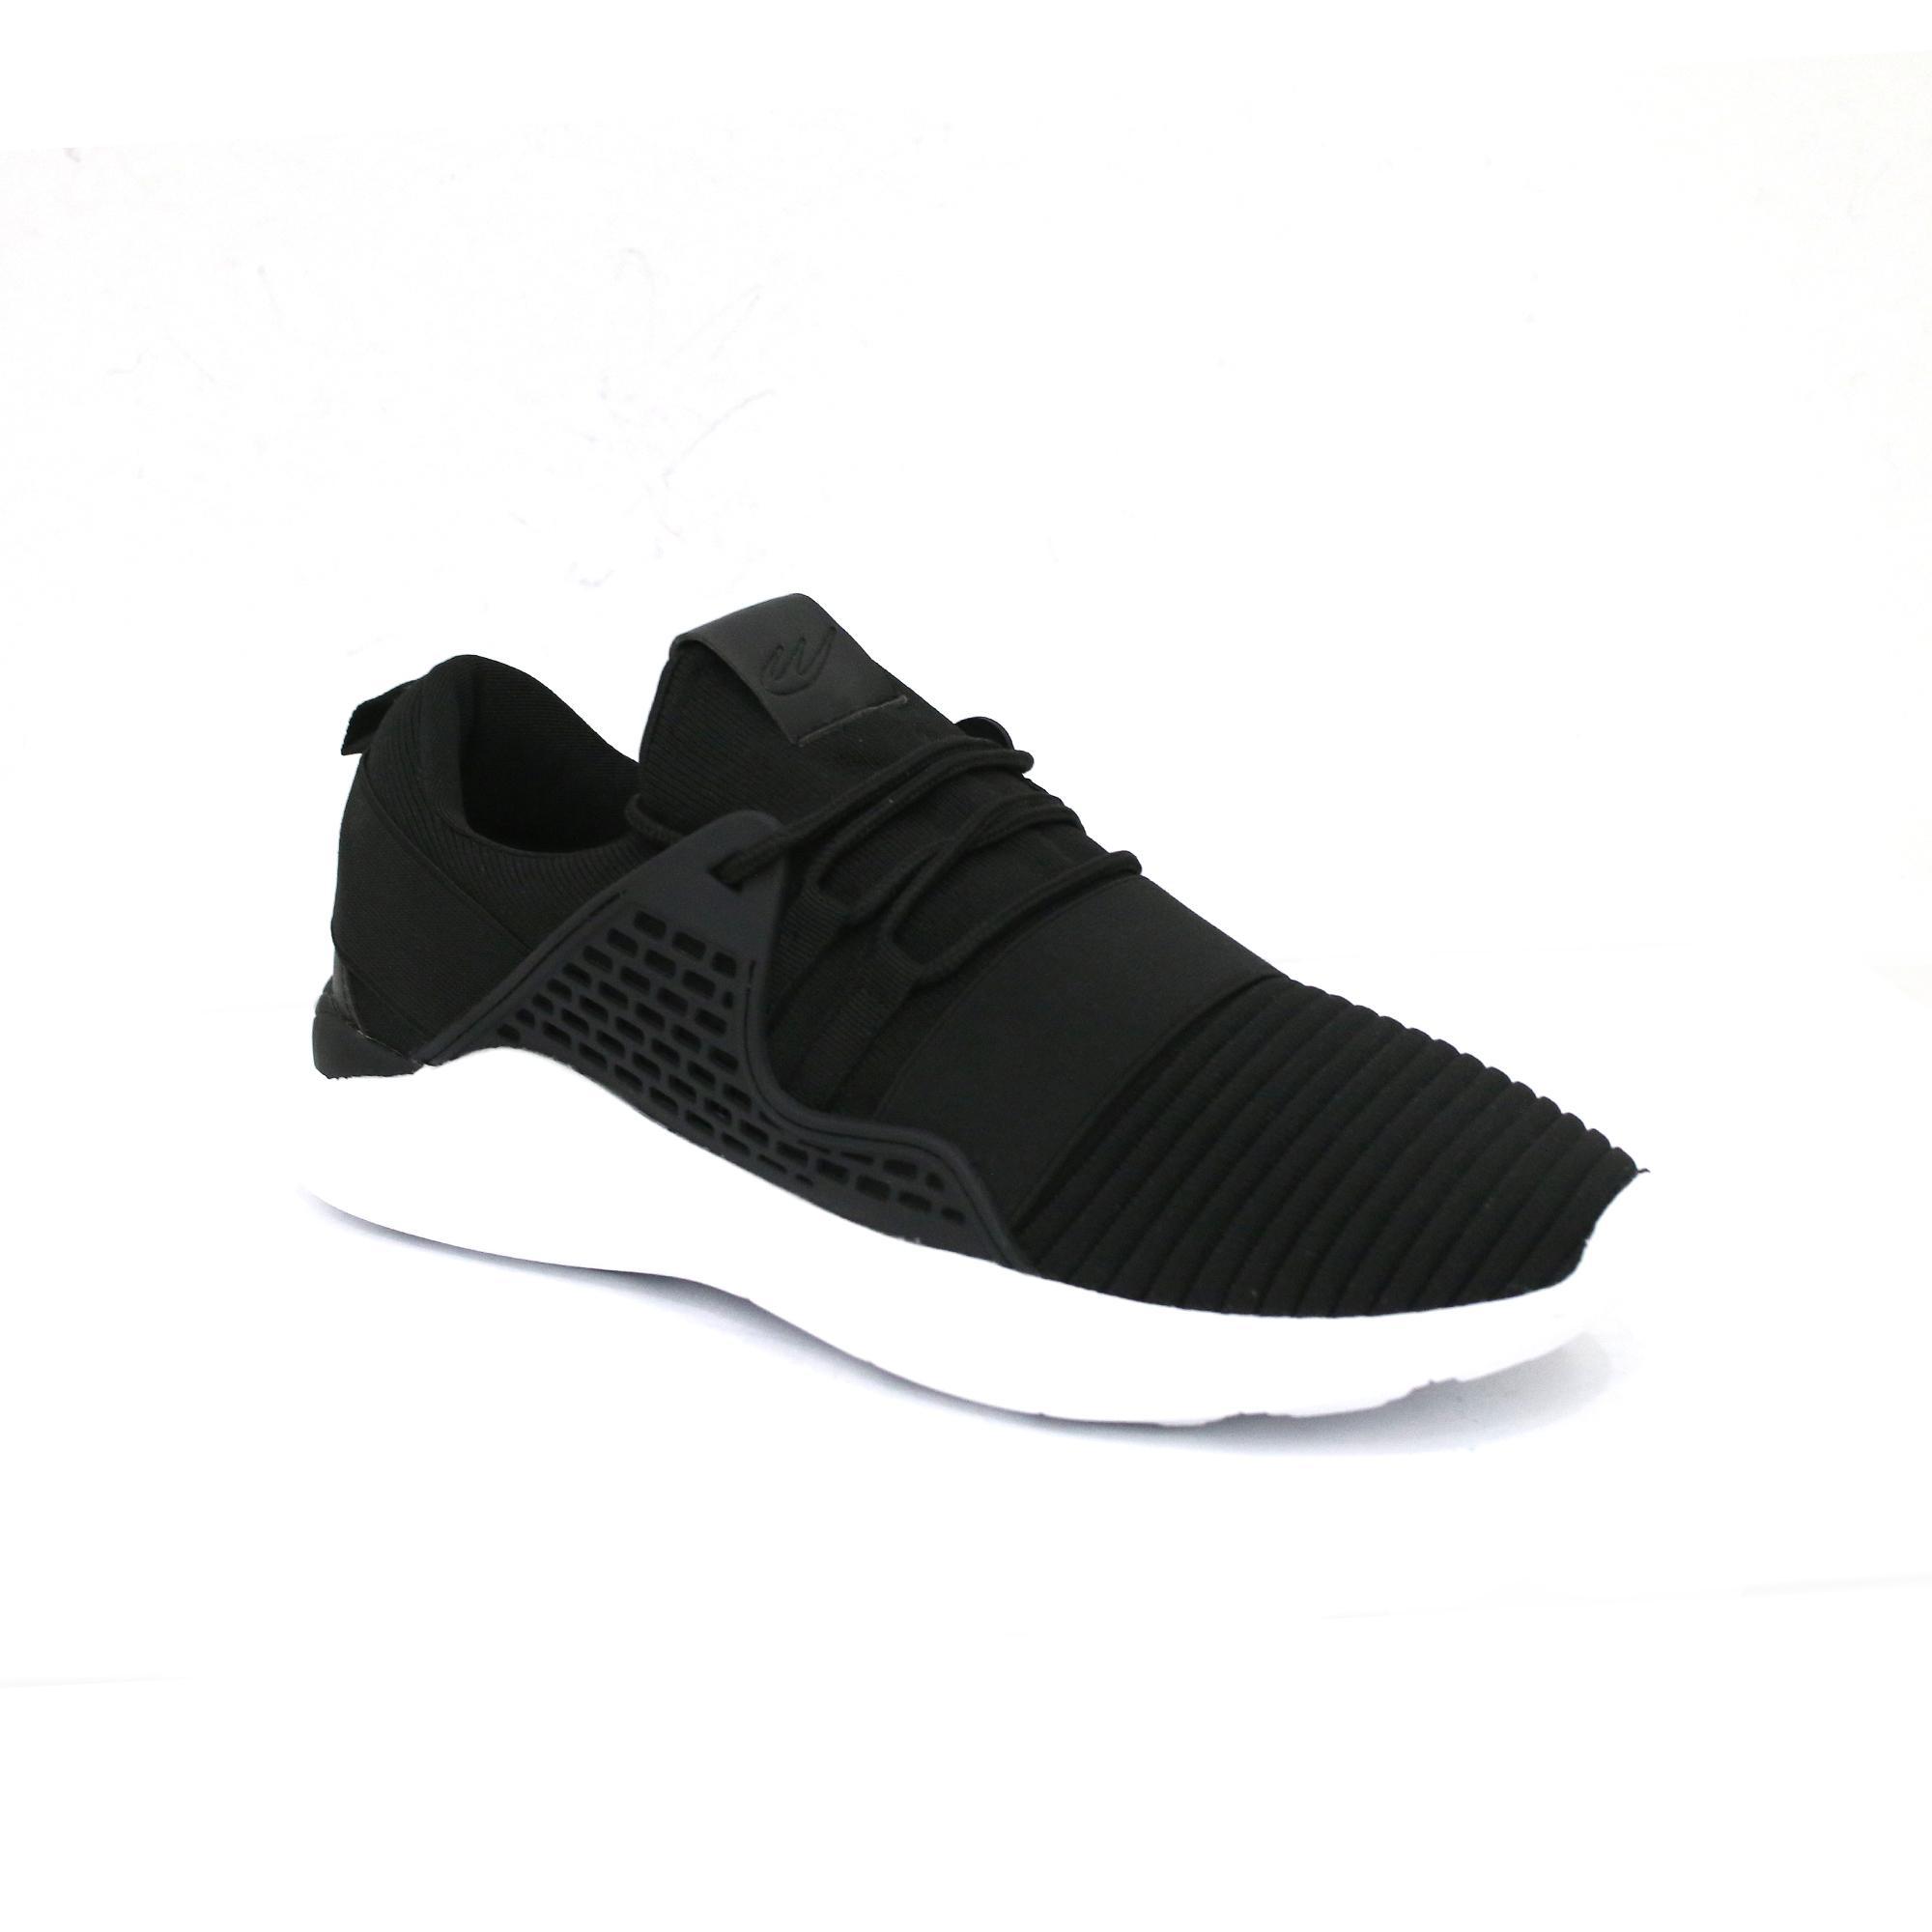 world balance rubber black shoes